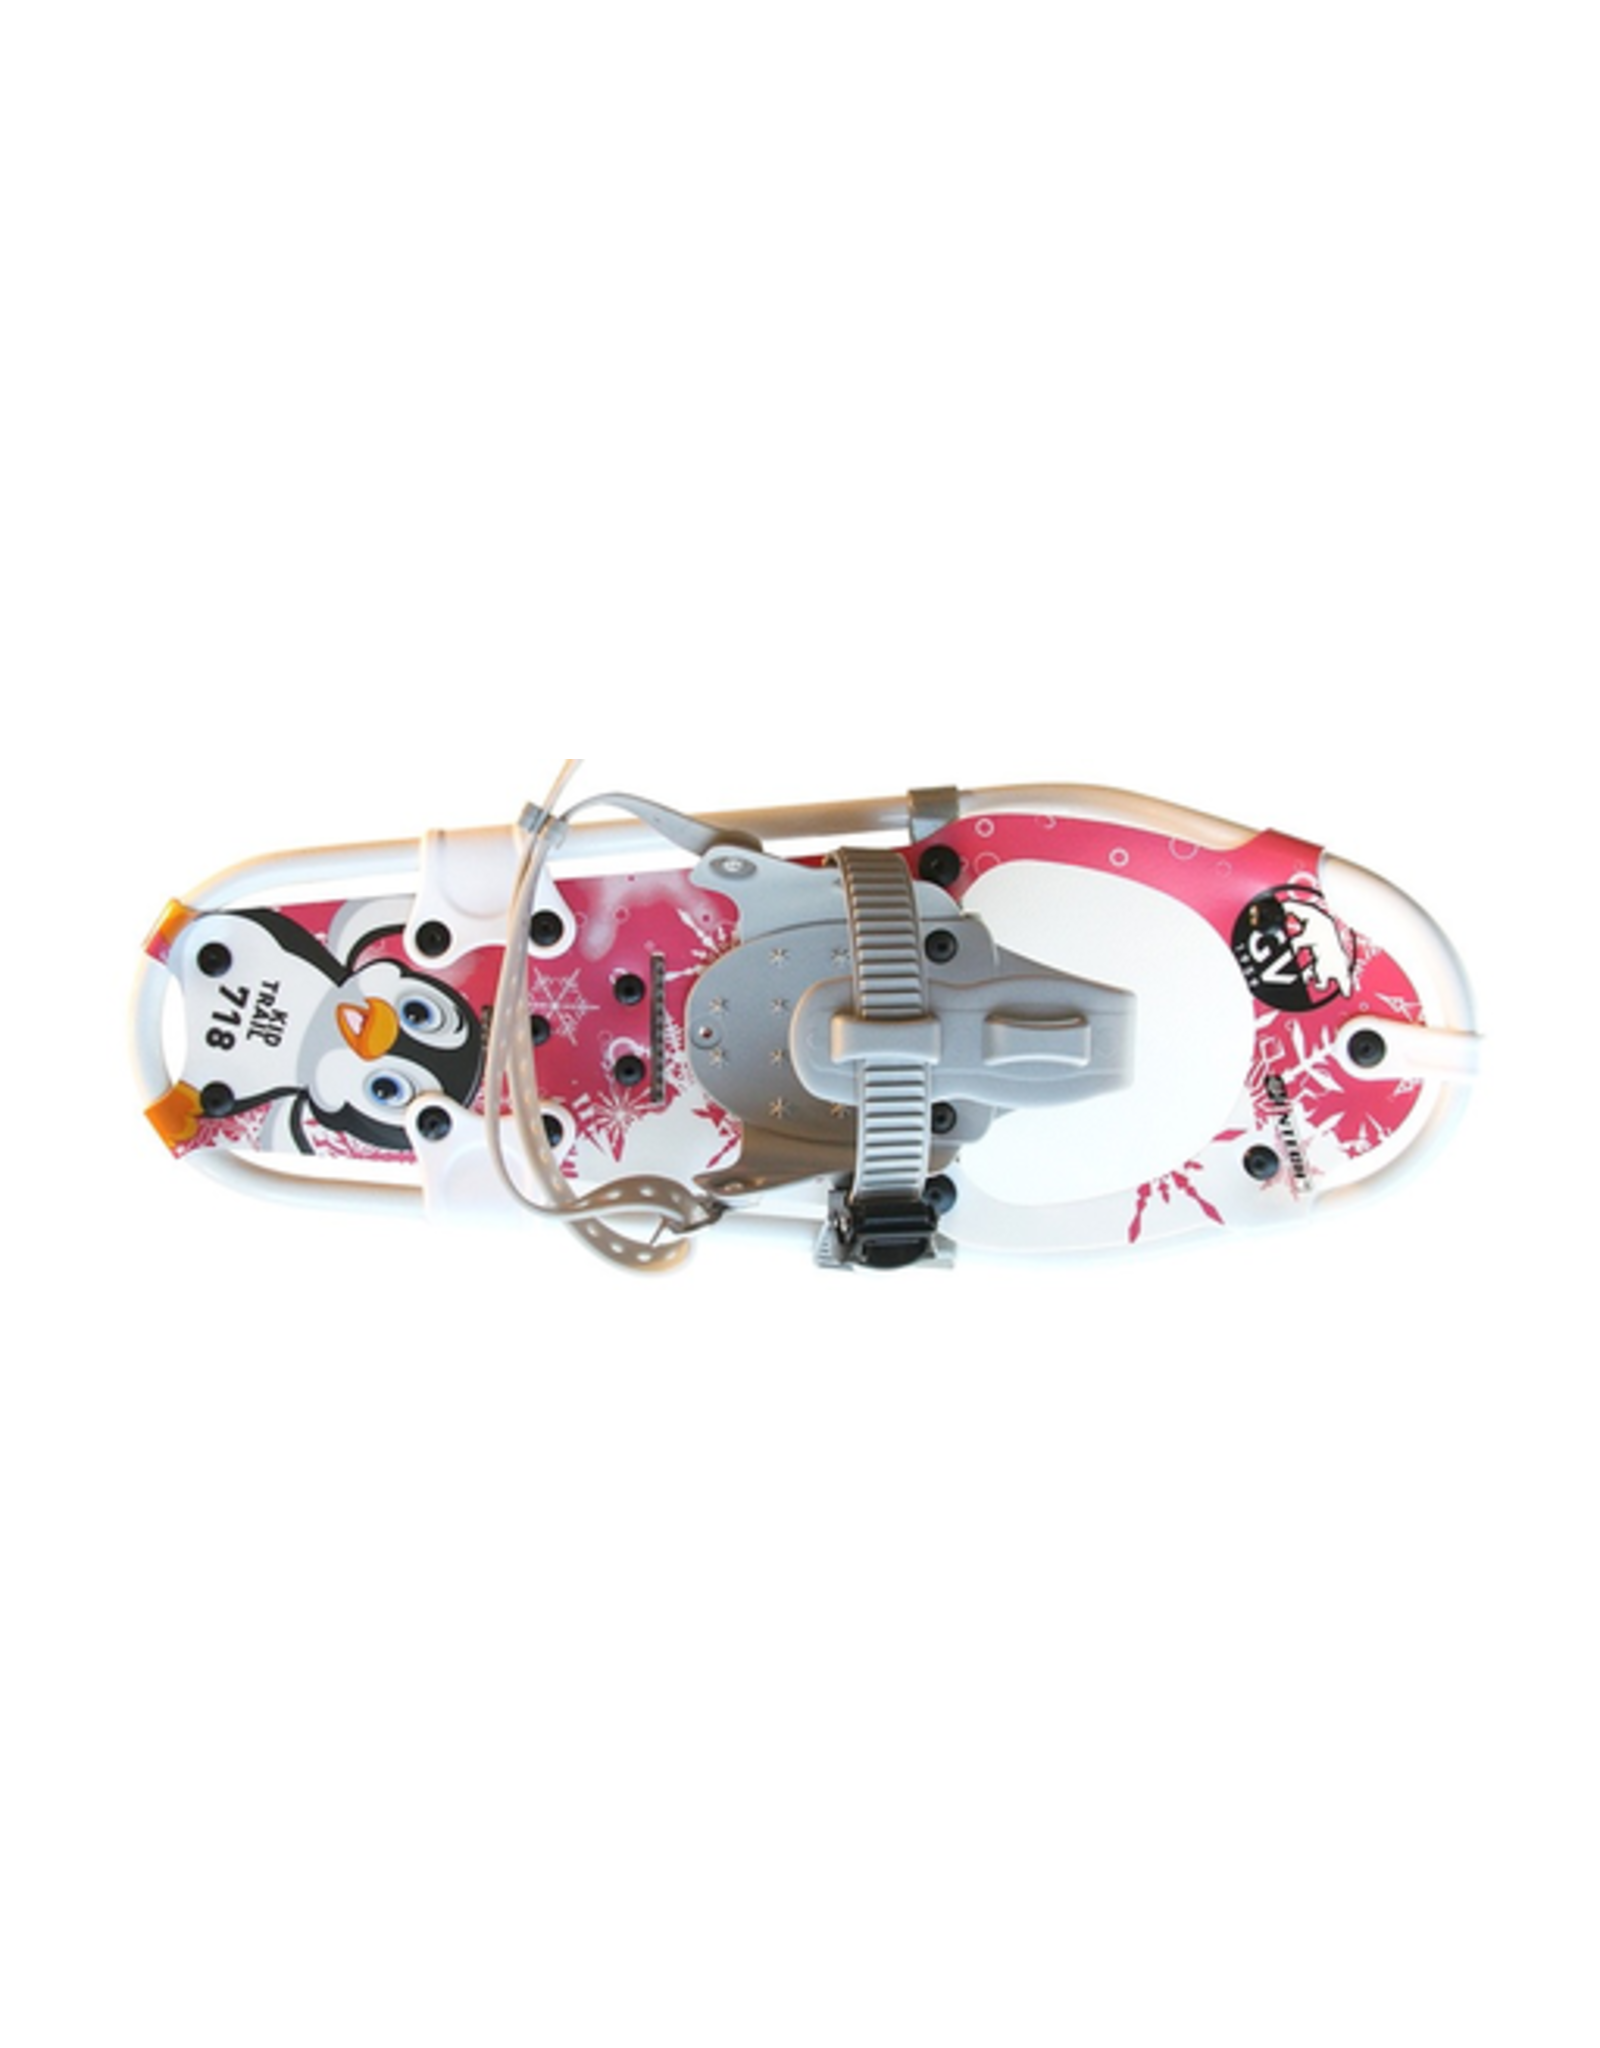 GV Snowshoes GV Kid Trail Girls, Pink, 7x18